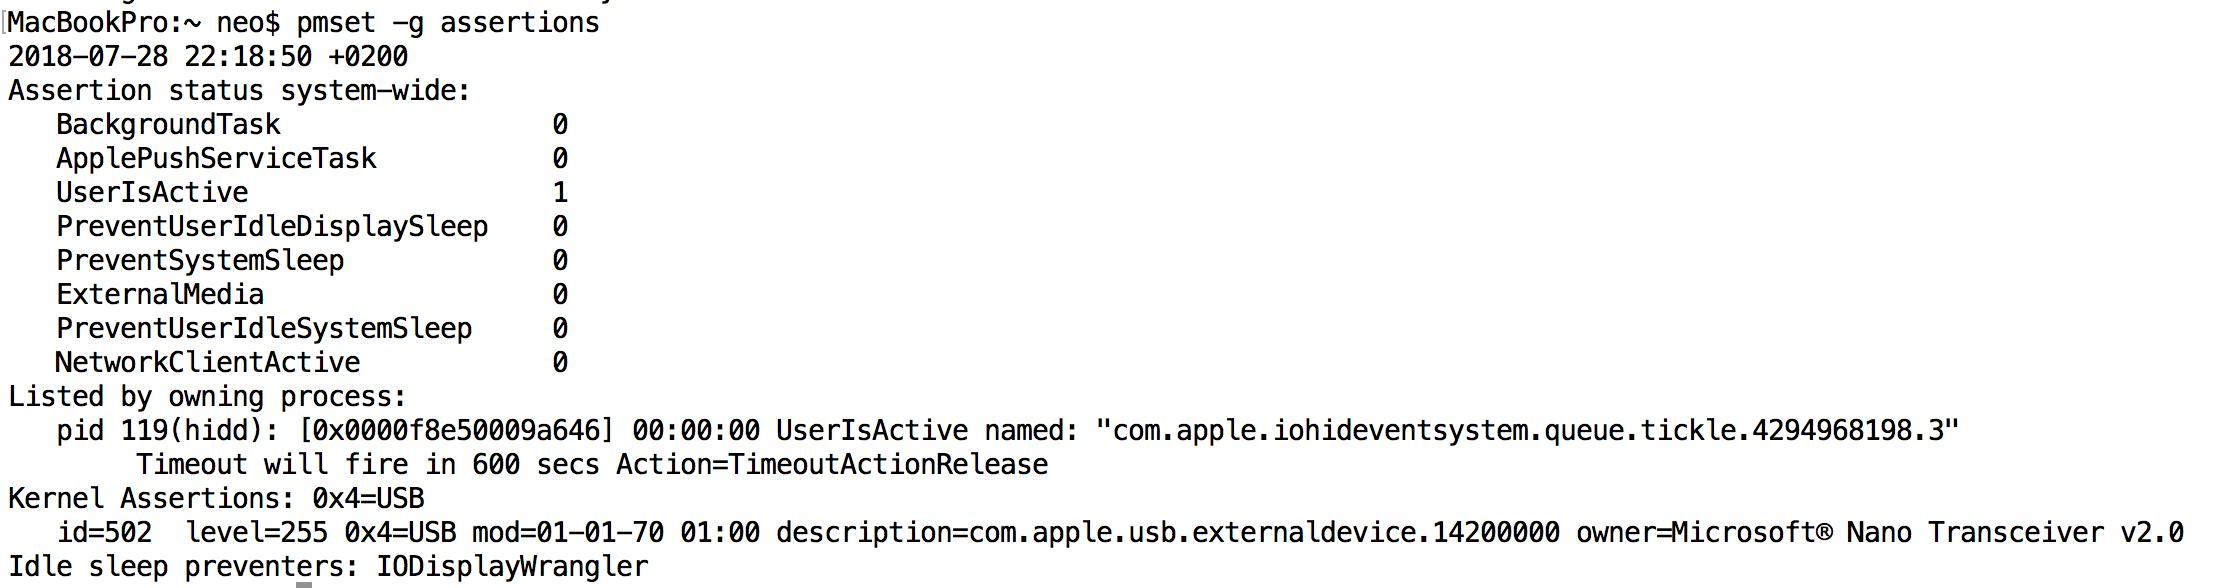 macbook pro 2013 dicht maar blijft aan en loopt leeg » One More Thing